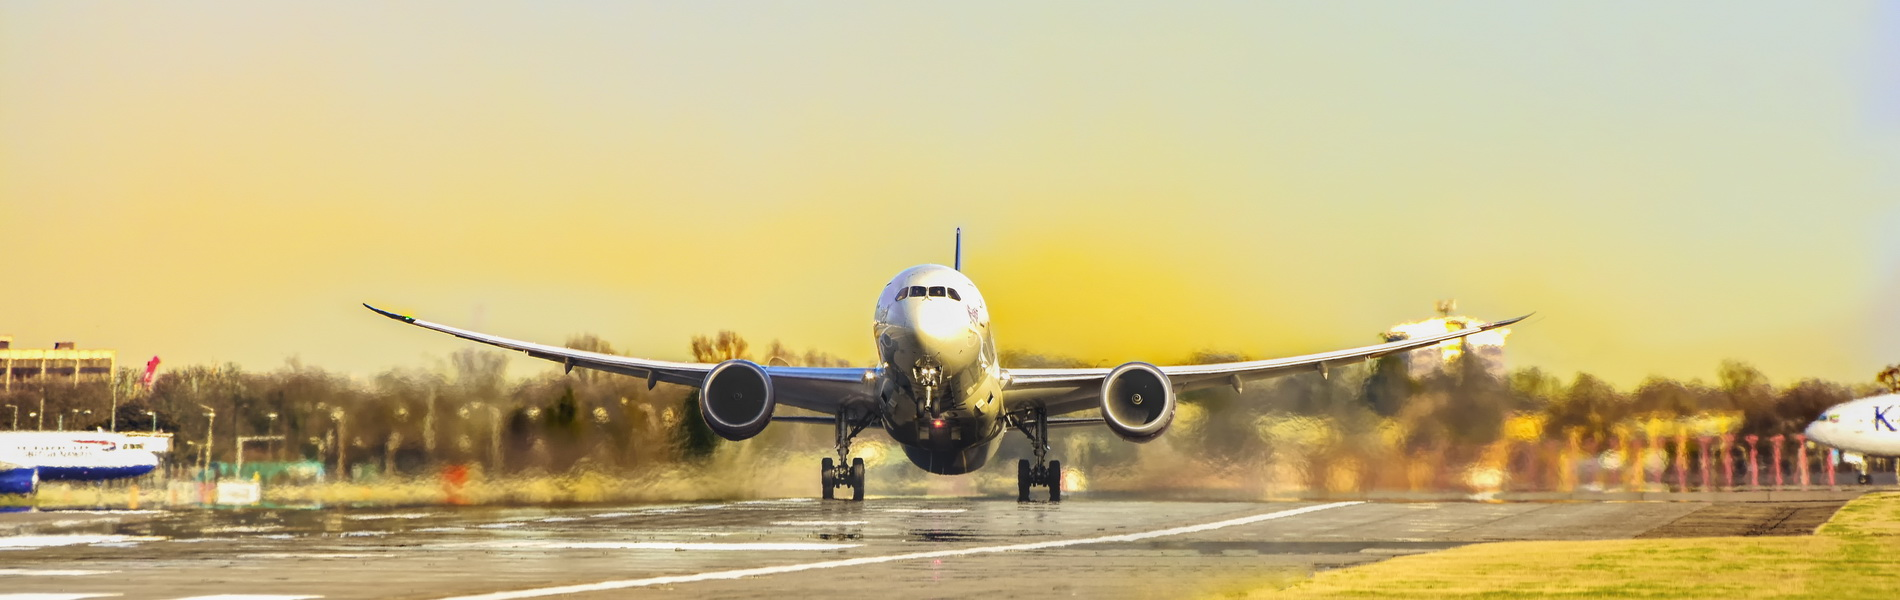 Flugzeug beim abheben, CC0 Creative Commons